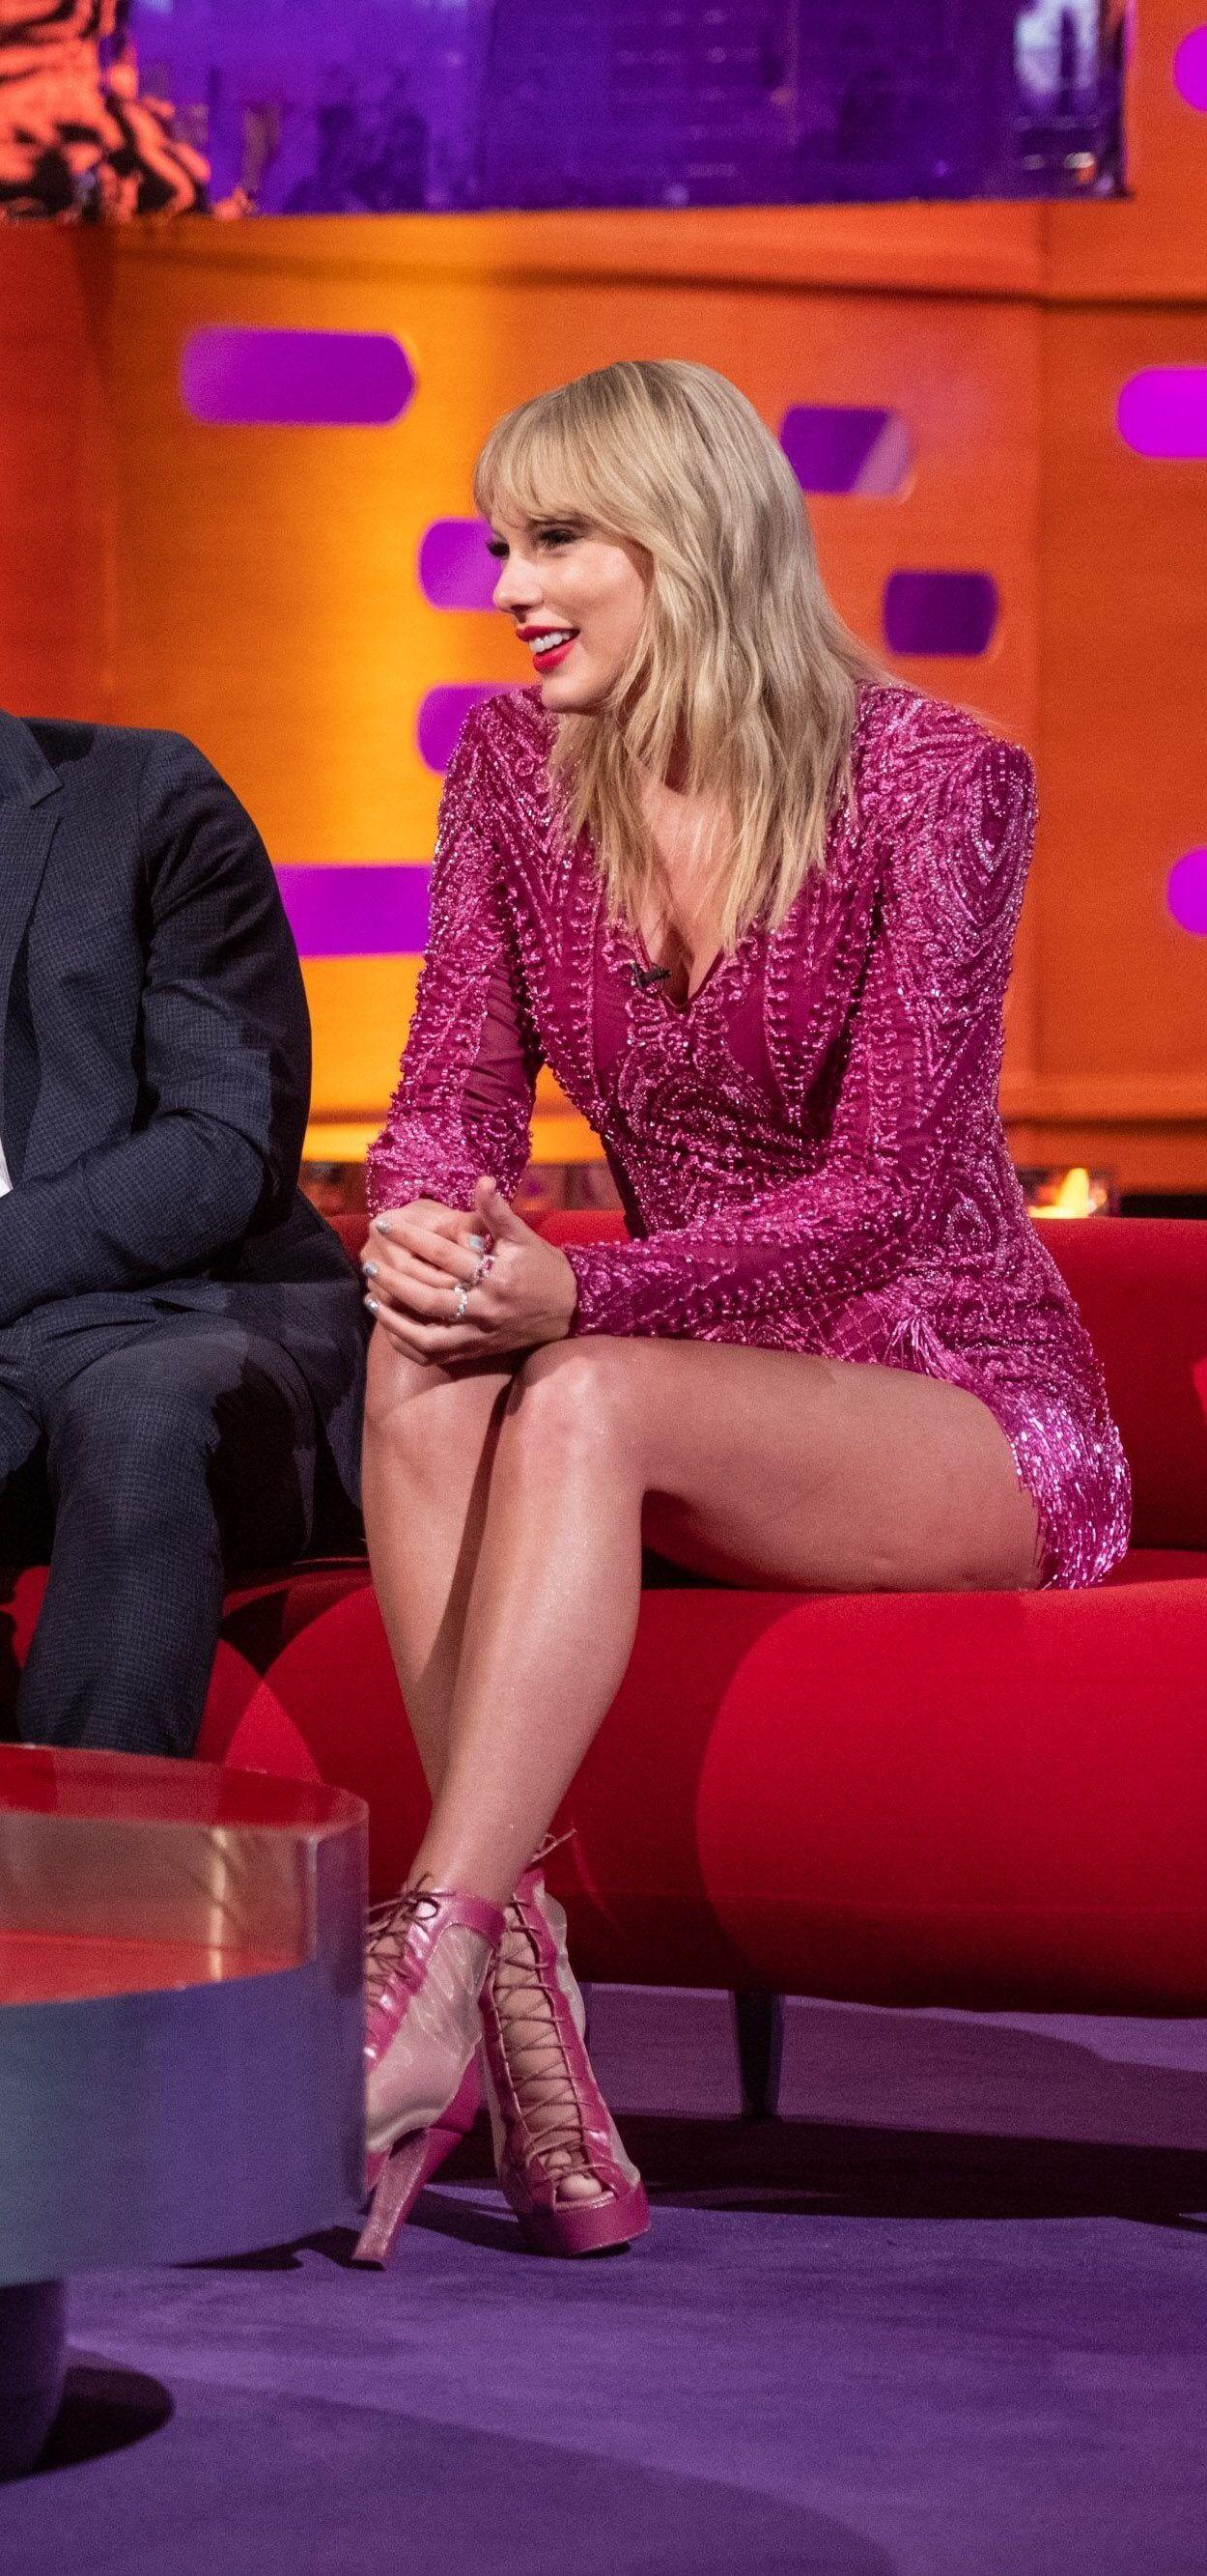 Taylor Swift Queen Taylor swift hot